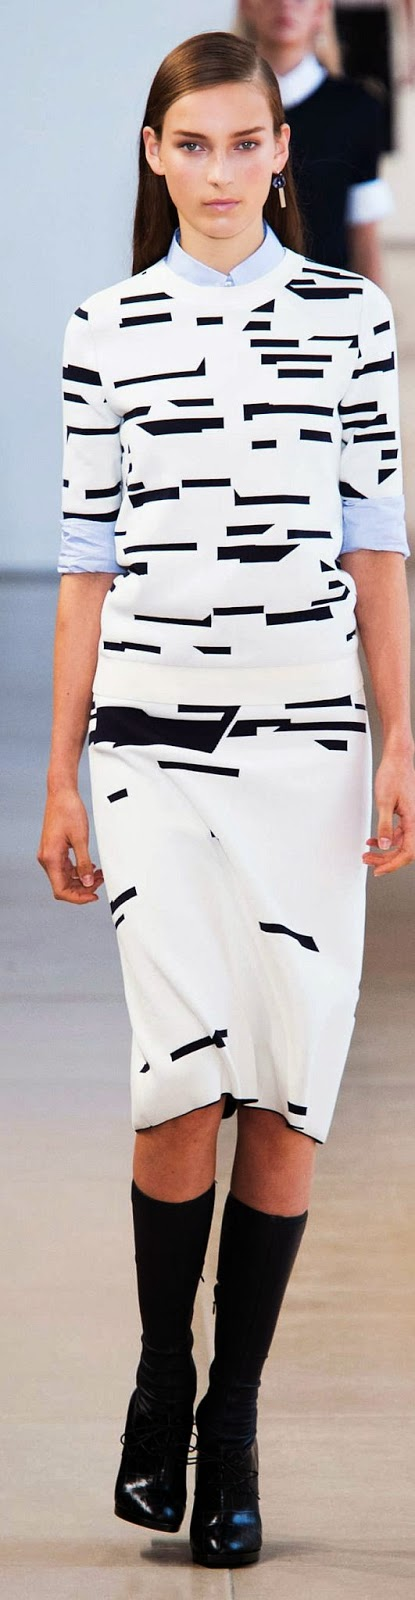 Dolce&Gabbana e Jil Sander  meias primavera 2015